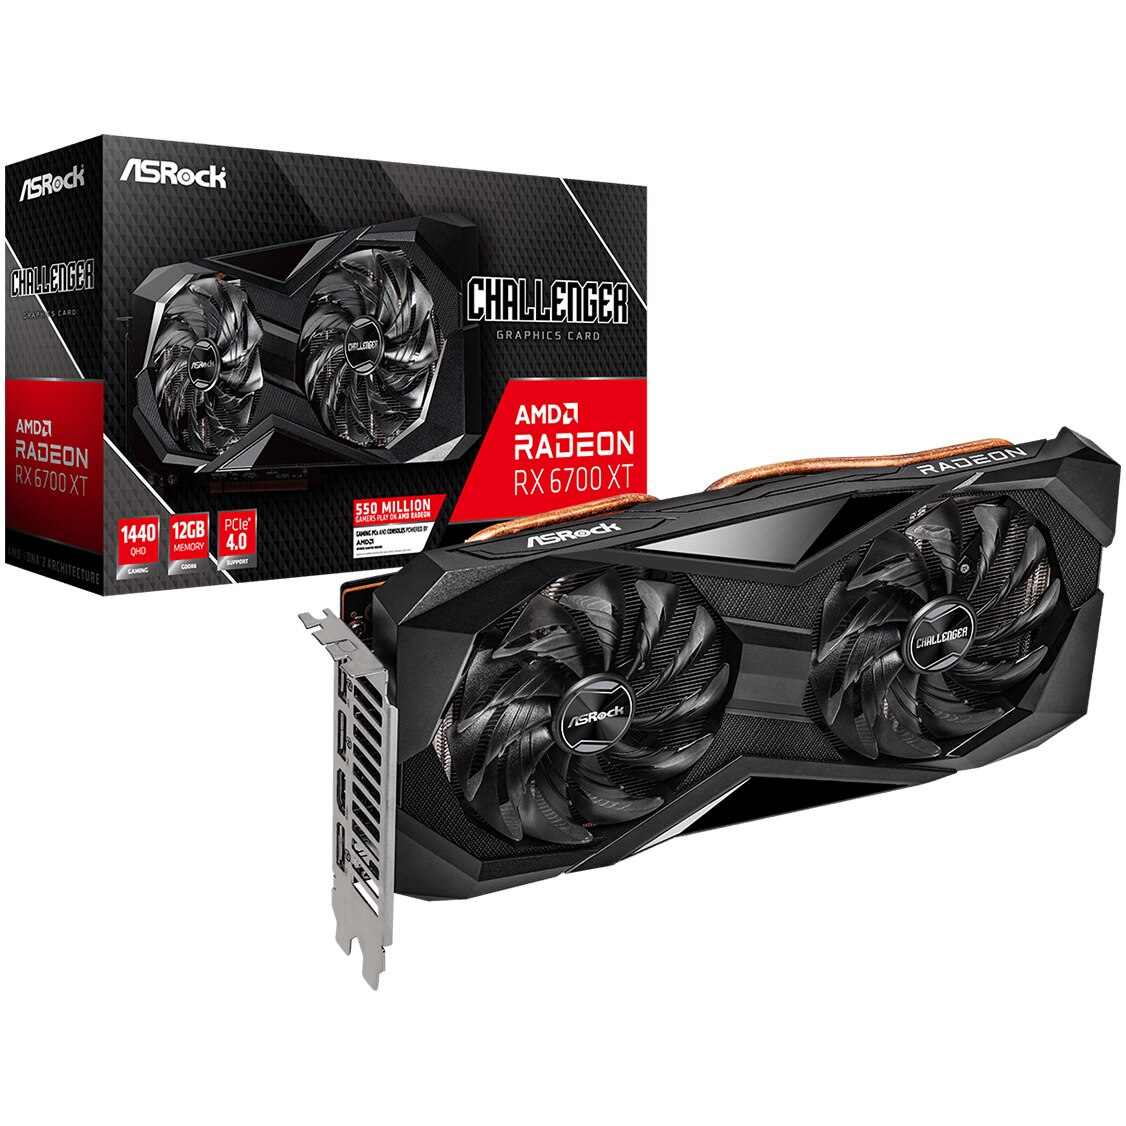 Fotografie Placa video ASRock Radeon™ RX 6700 XT Challenger D, 12GB GDDR6, 192-bit